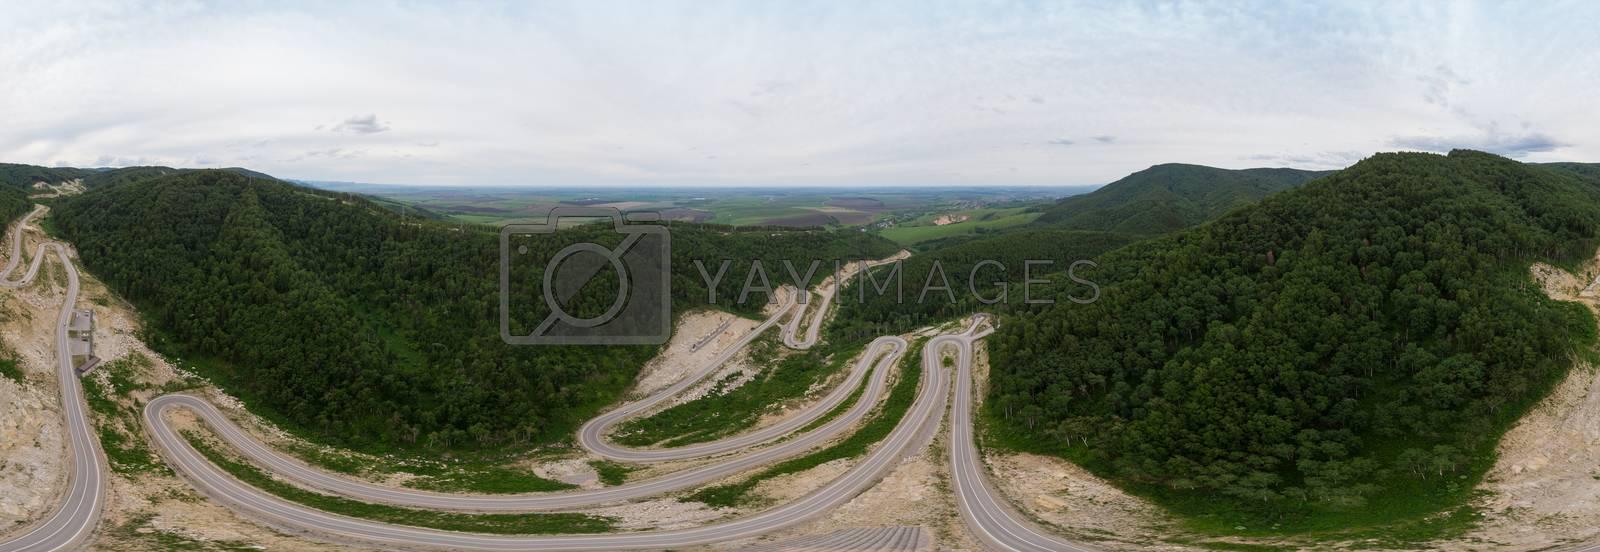 Full 360 equirectangular spherical panorama of aerial top vew of winding road in the mountains, drone shot. Altai Krai, Western Siberia, Russia. Road to Resort town Belokurikha 2. Virtual reality content